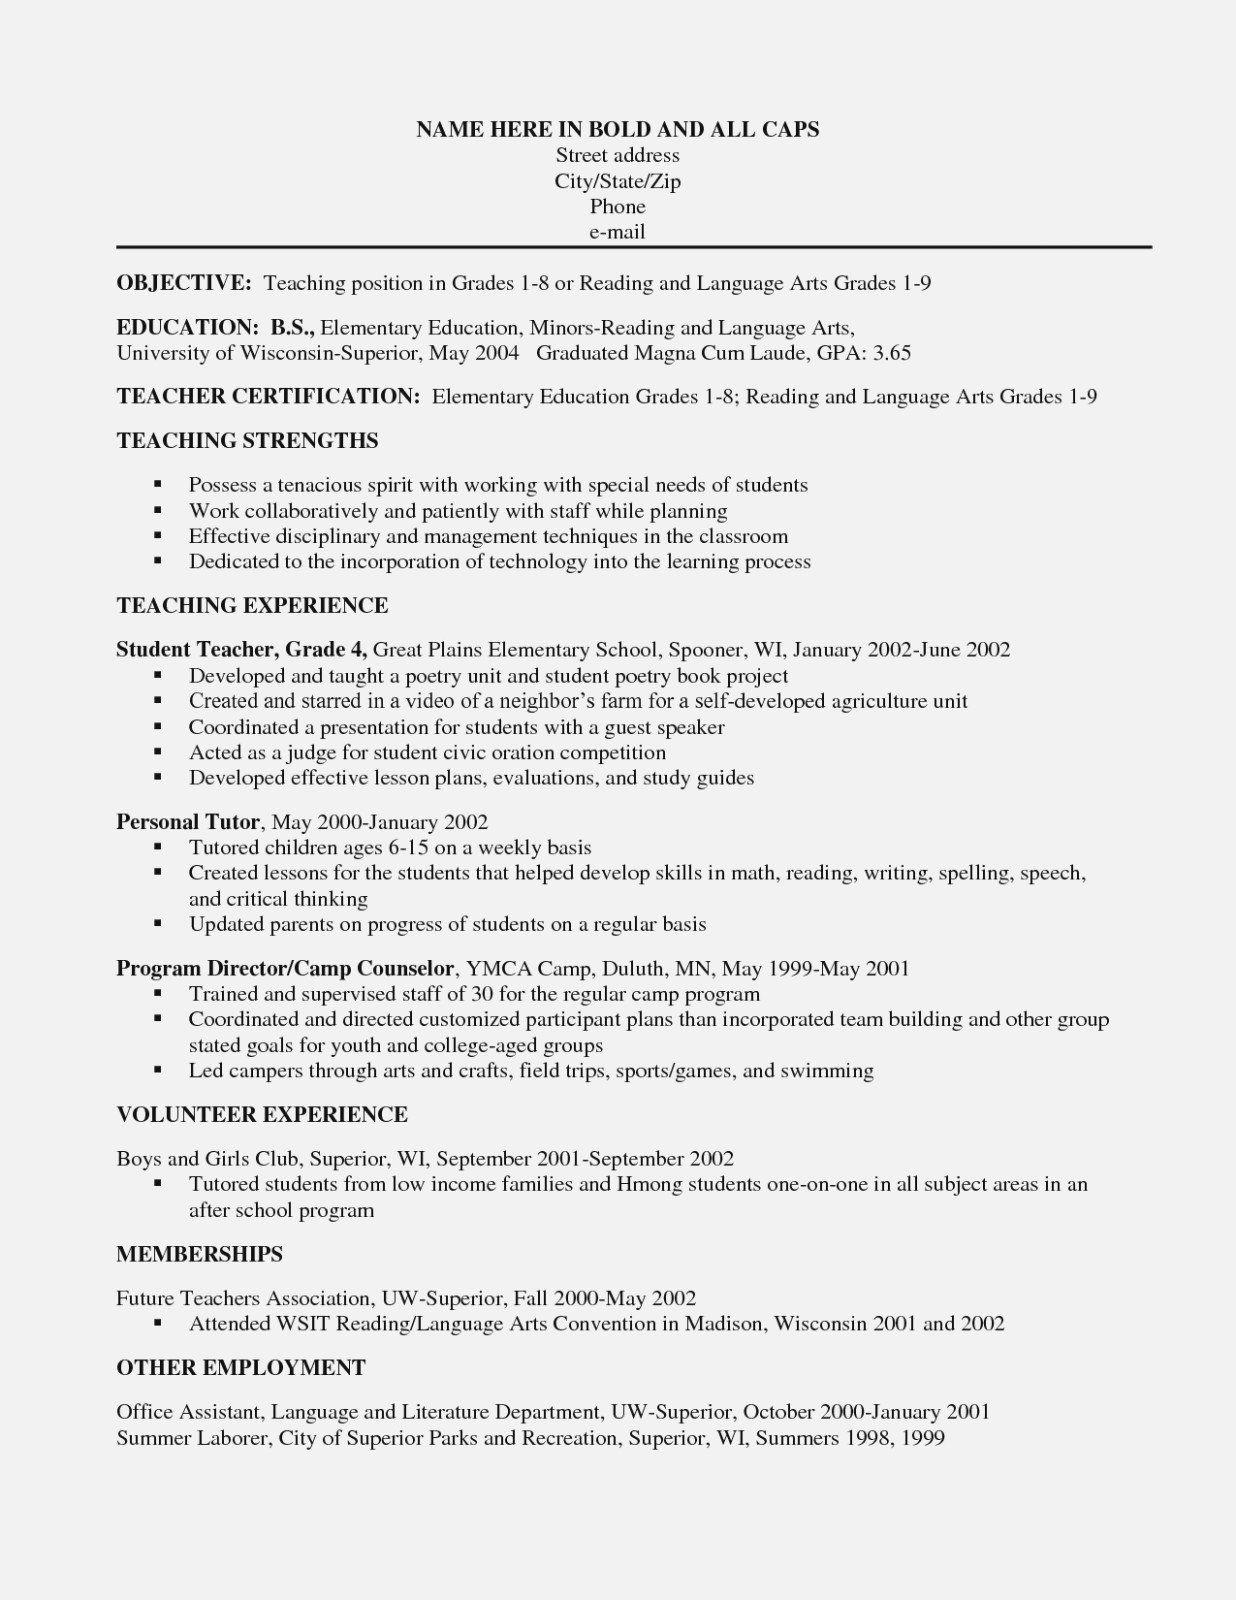 Sample Resume For Preschool Teacher Assistant Beautiful Teachers Aide Resume Examples Presch Teacher Resume Elementary Teacher Resume Resume Objective Examples